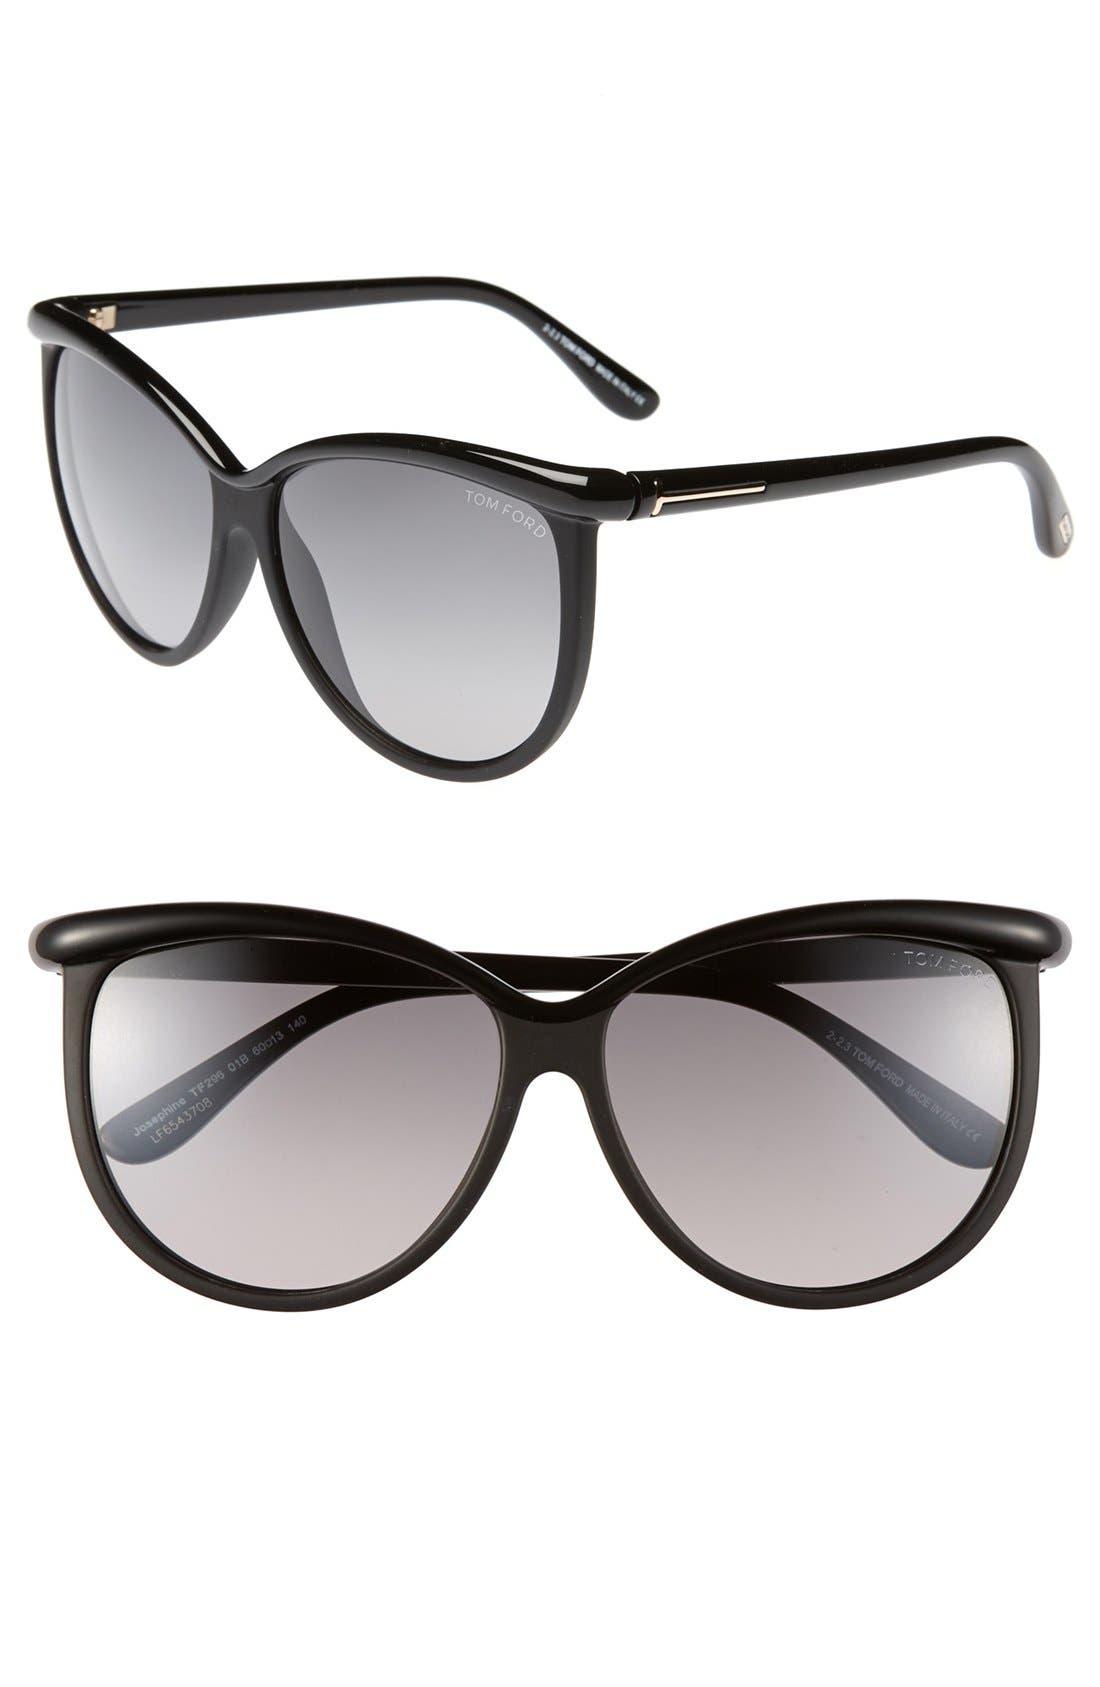 Main Image - Tom Ford 'Josephine' 60mm Sunglasses